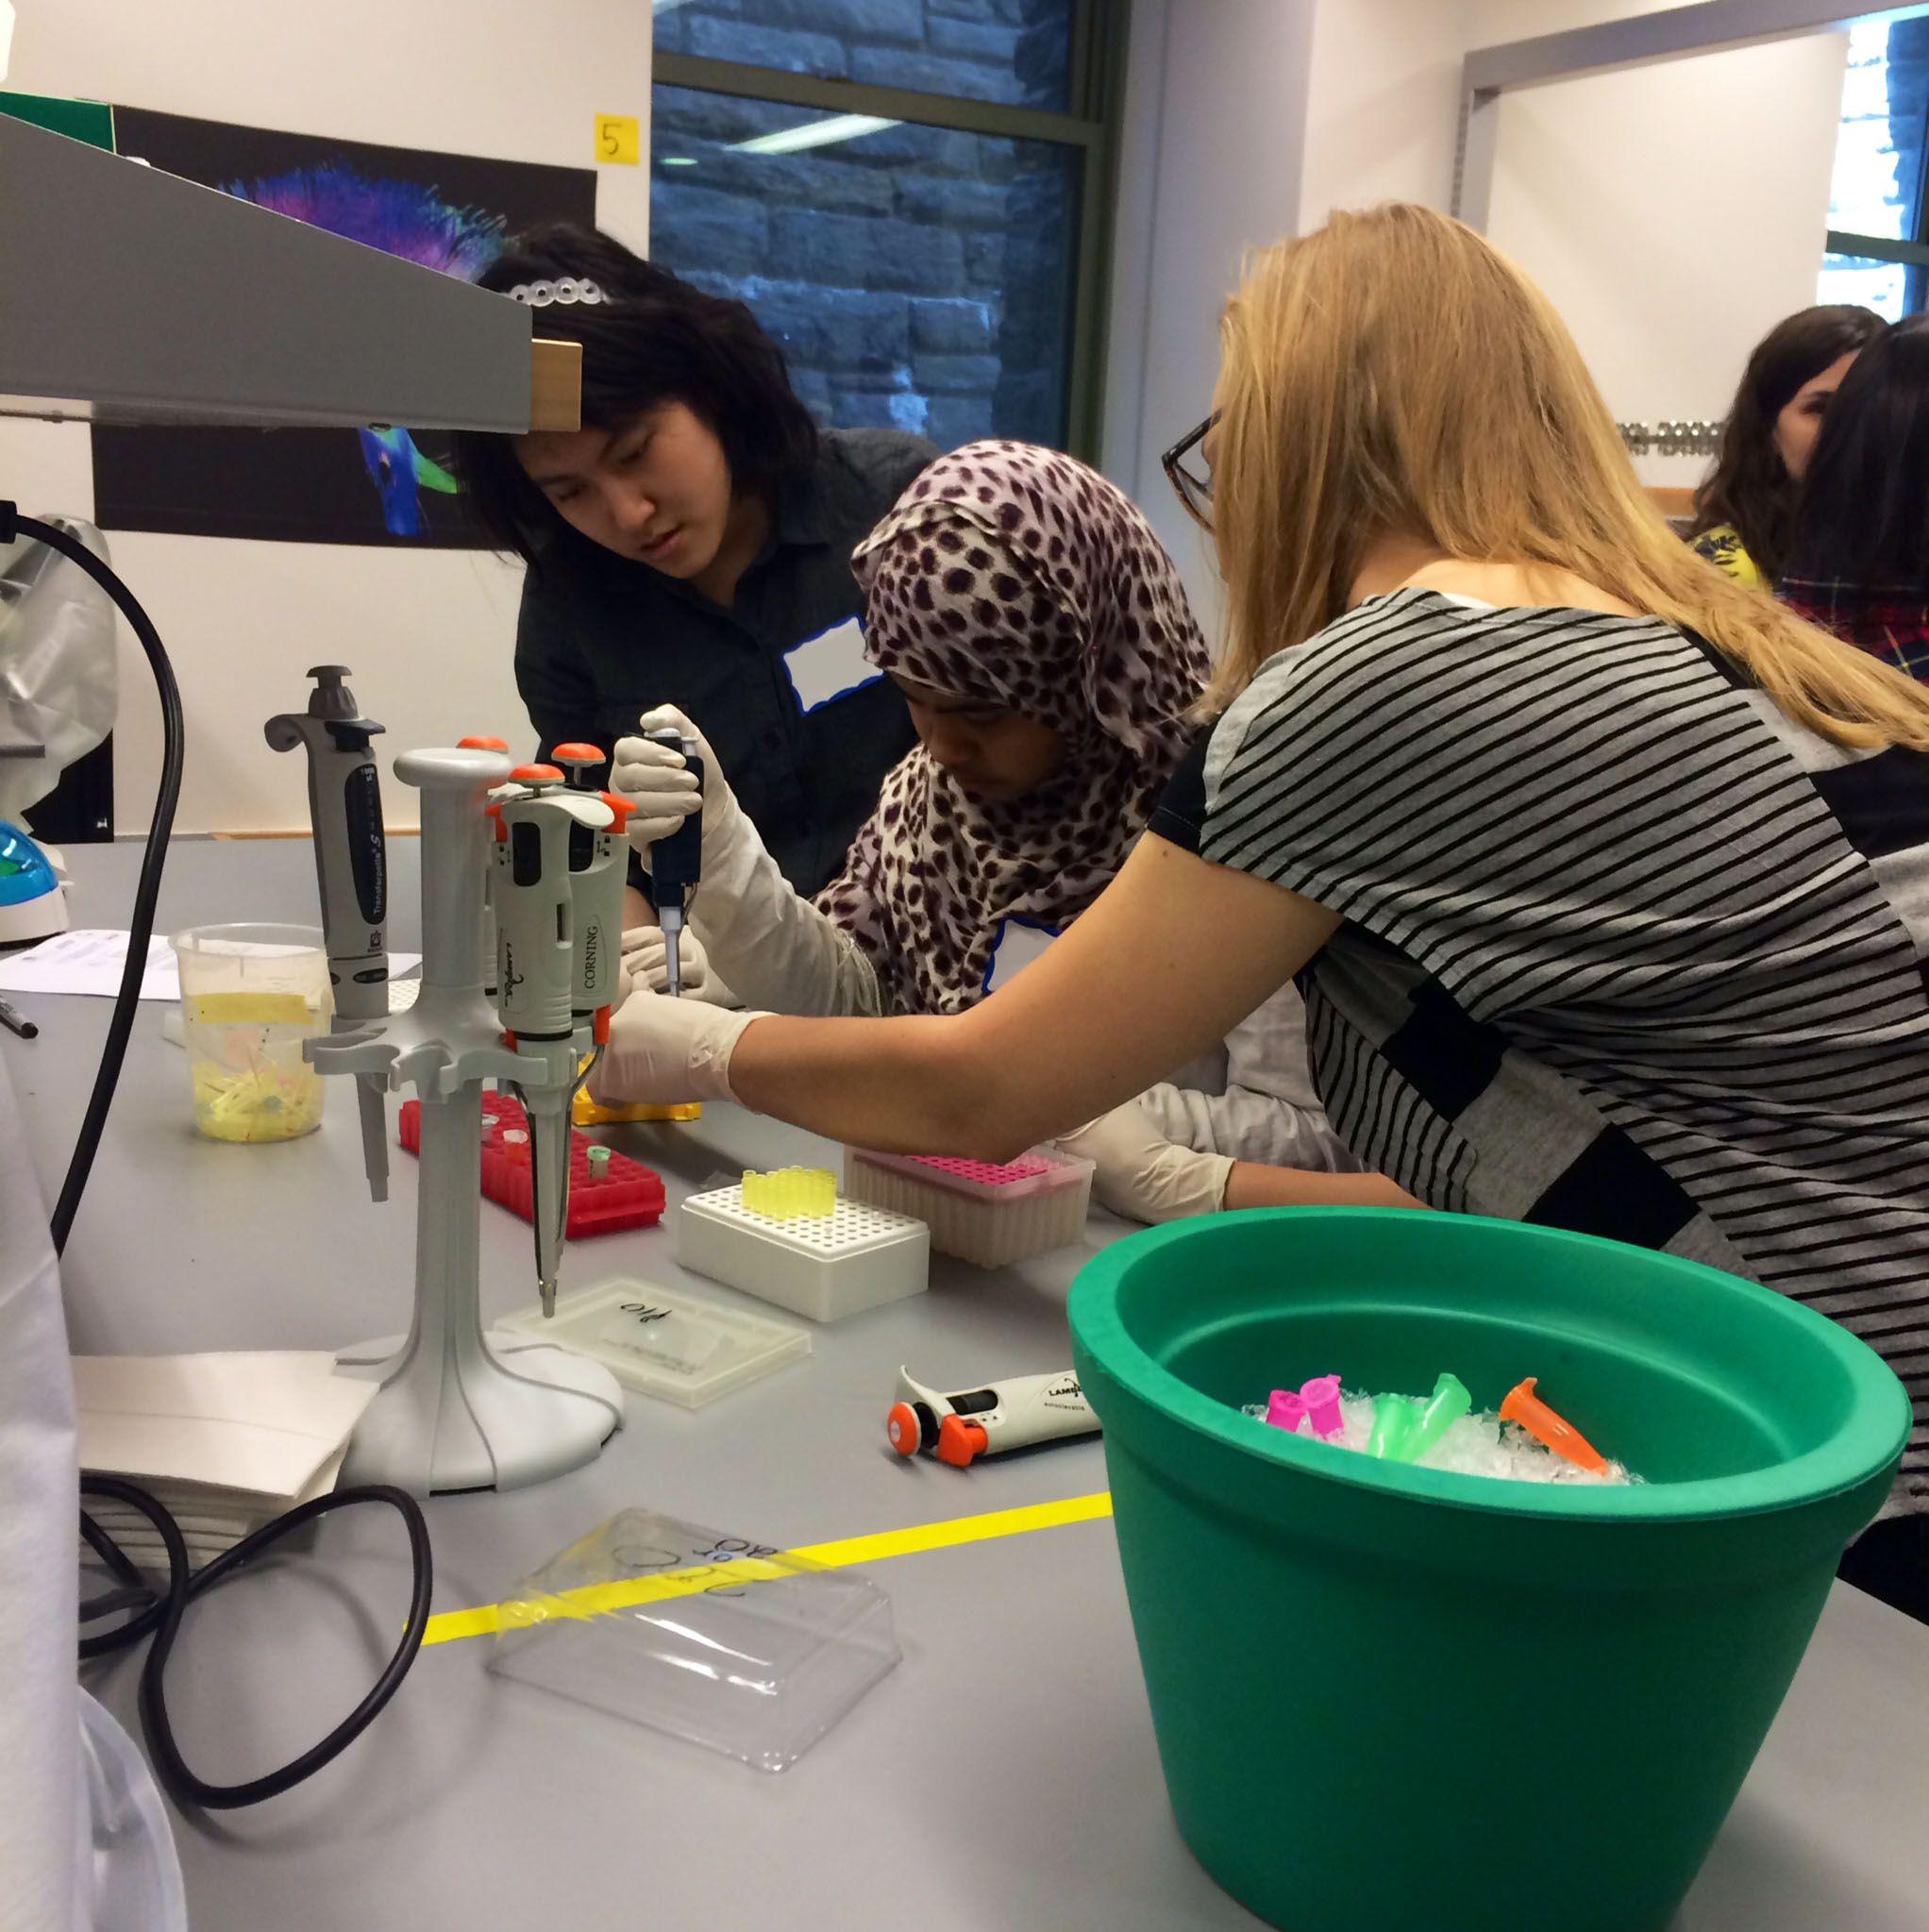 Stem School York: Graduate School Of Medical Sciences